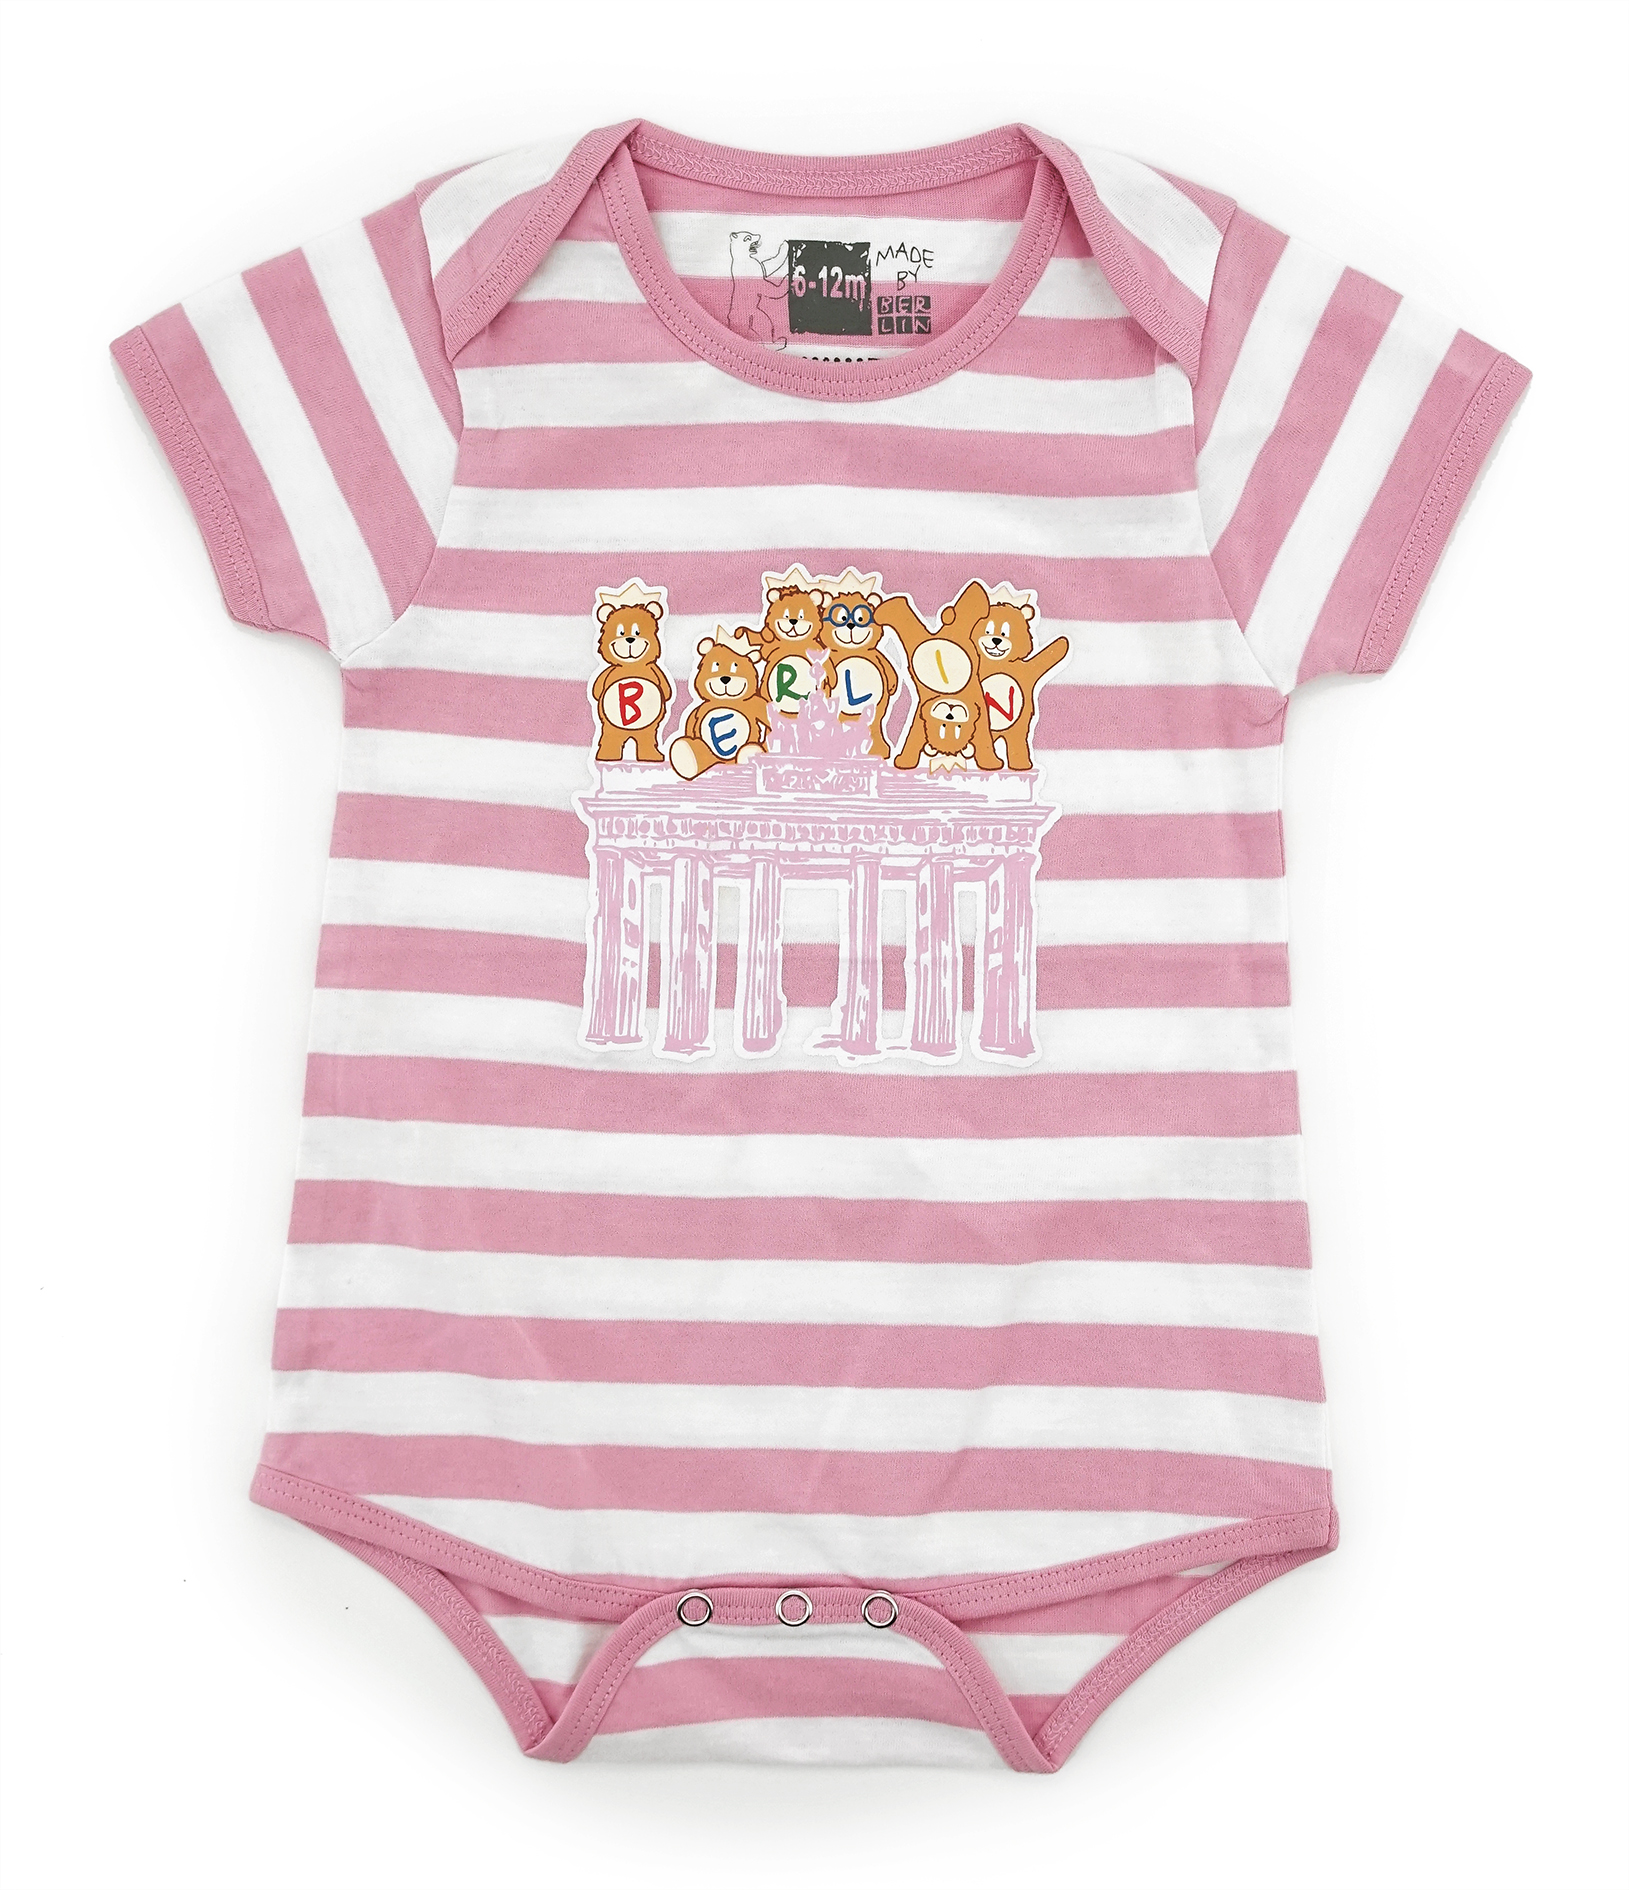 010-1051_Baby-Body_BERLIN_weiss-pink